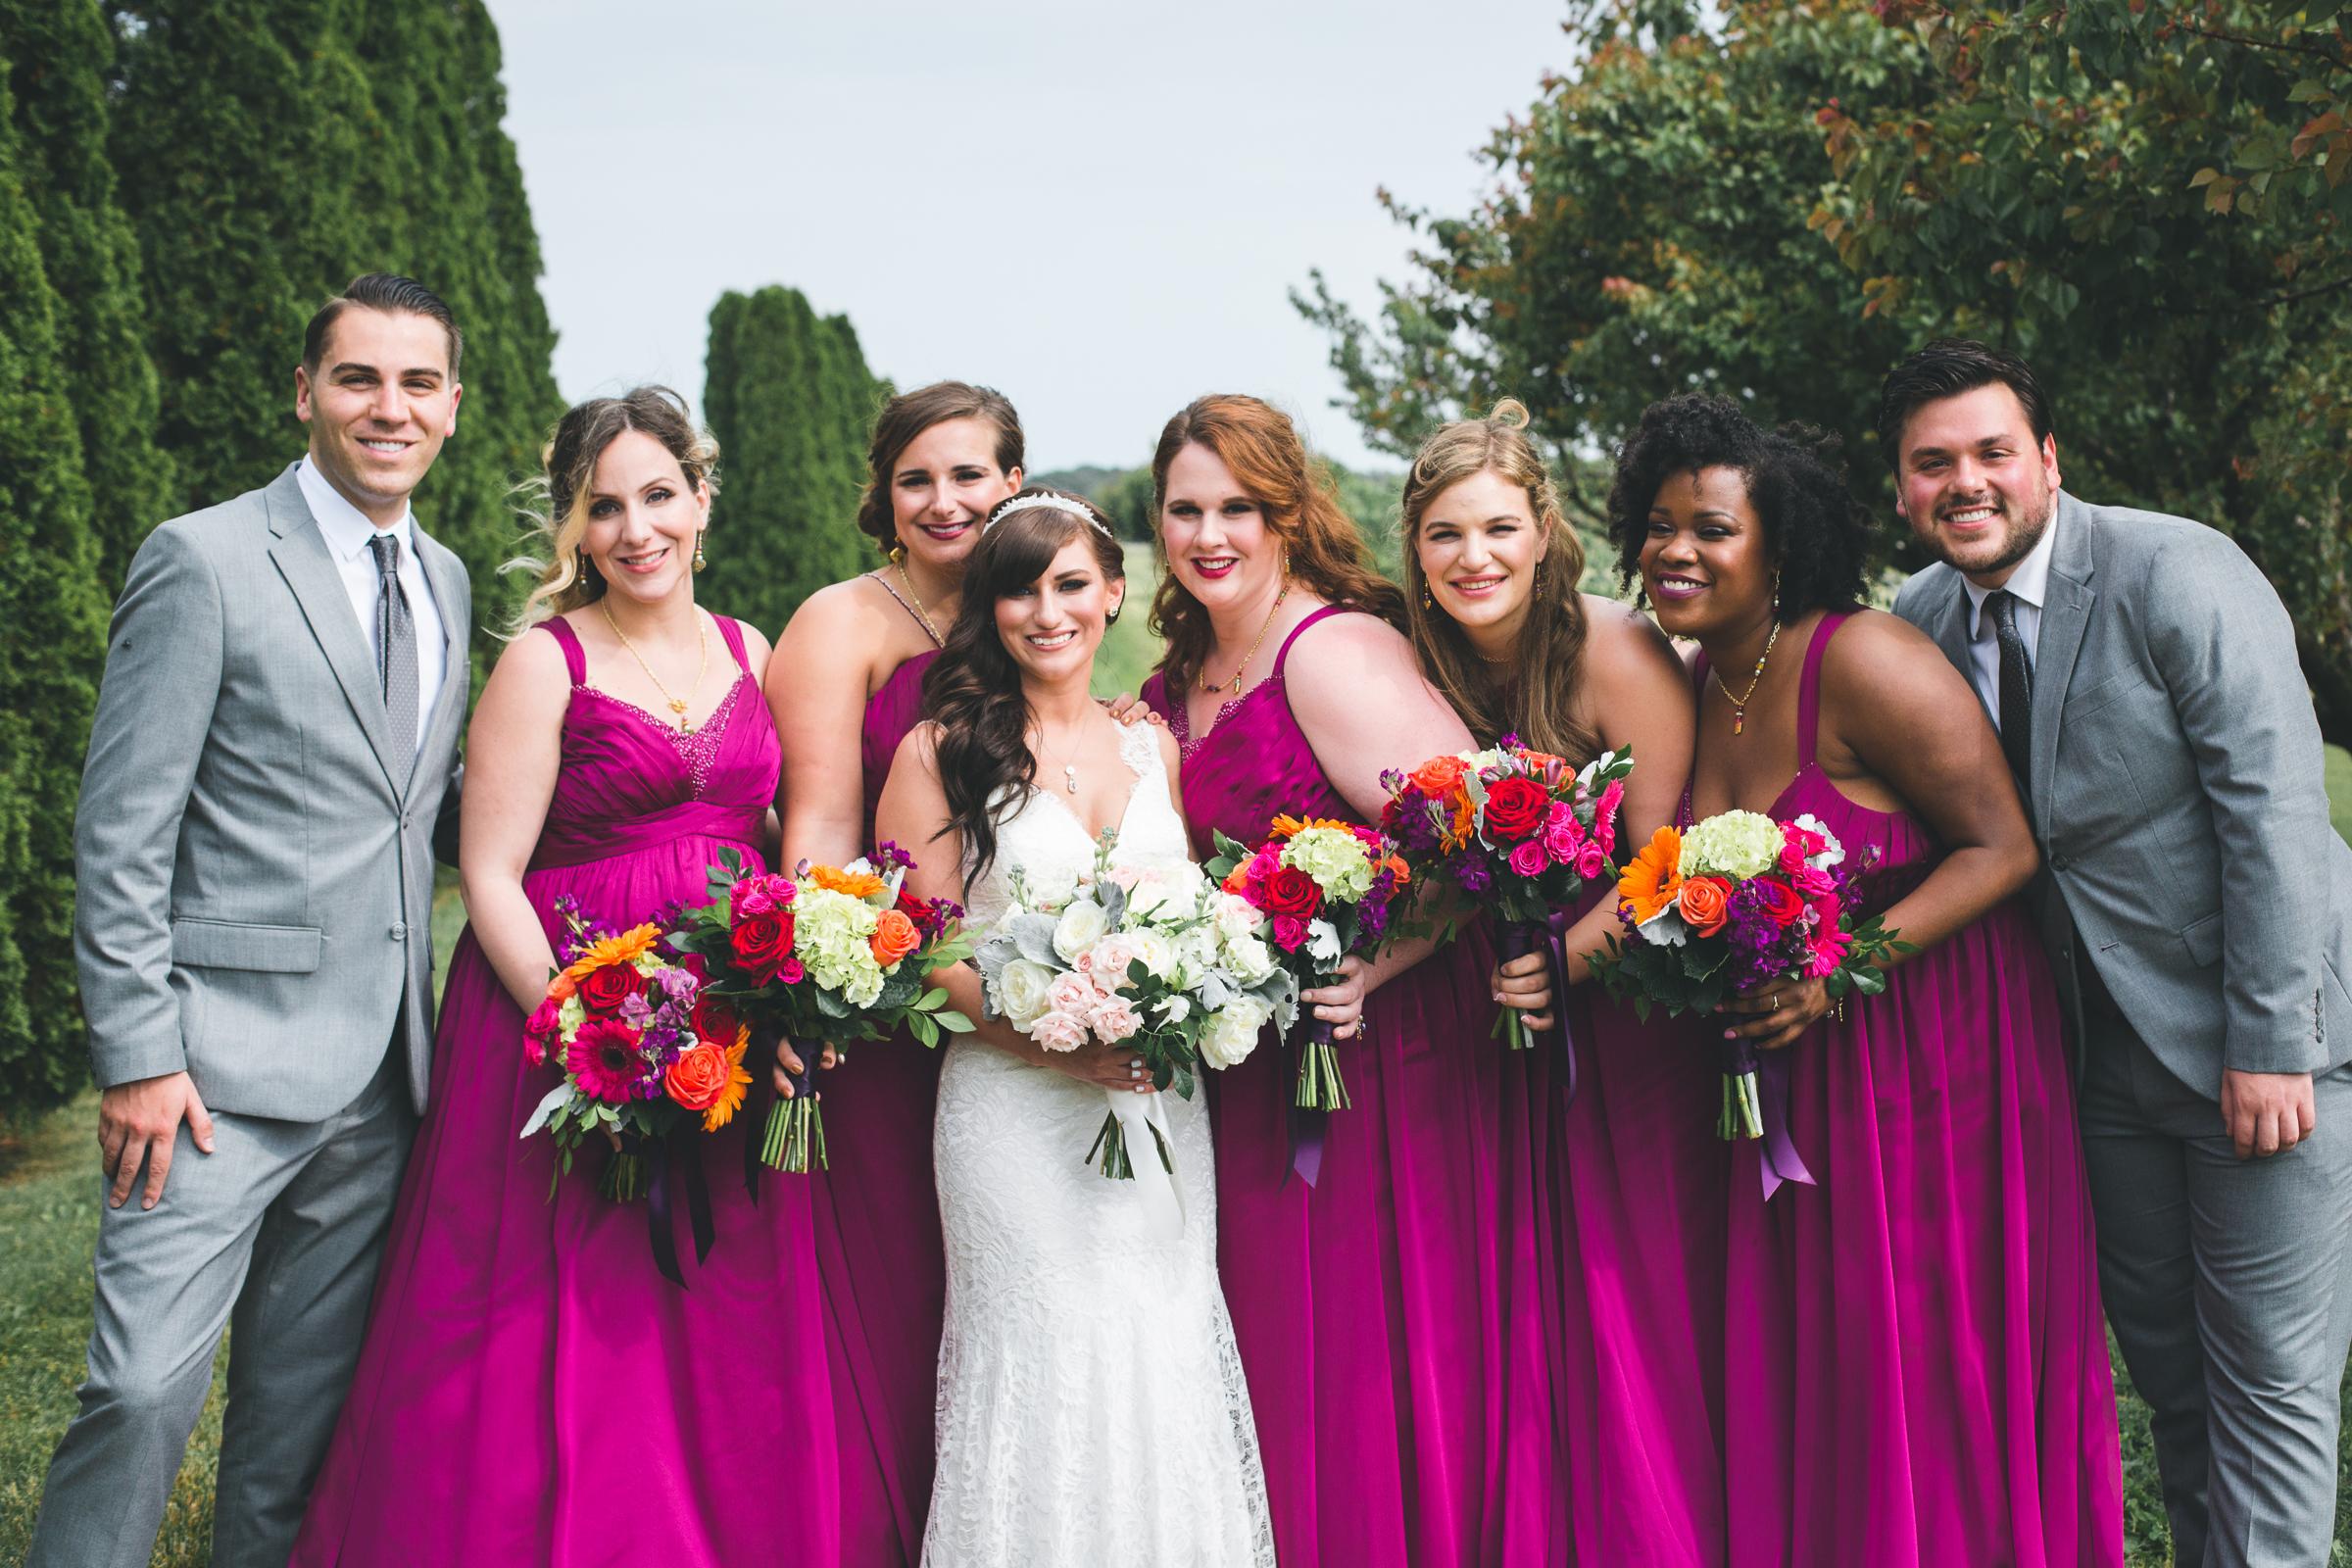 Martha-Clara-Vineyard-Long-Island-Documentary-Wedding-Photographer-20.jpg